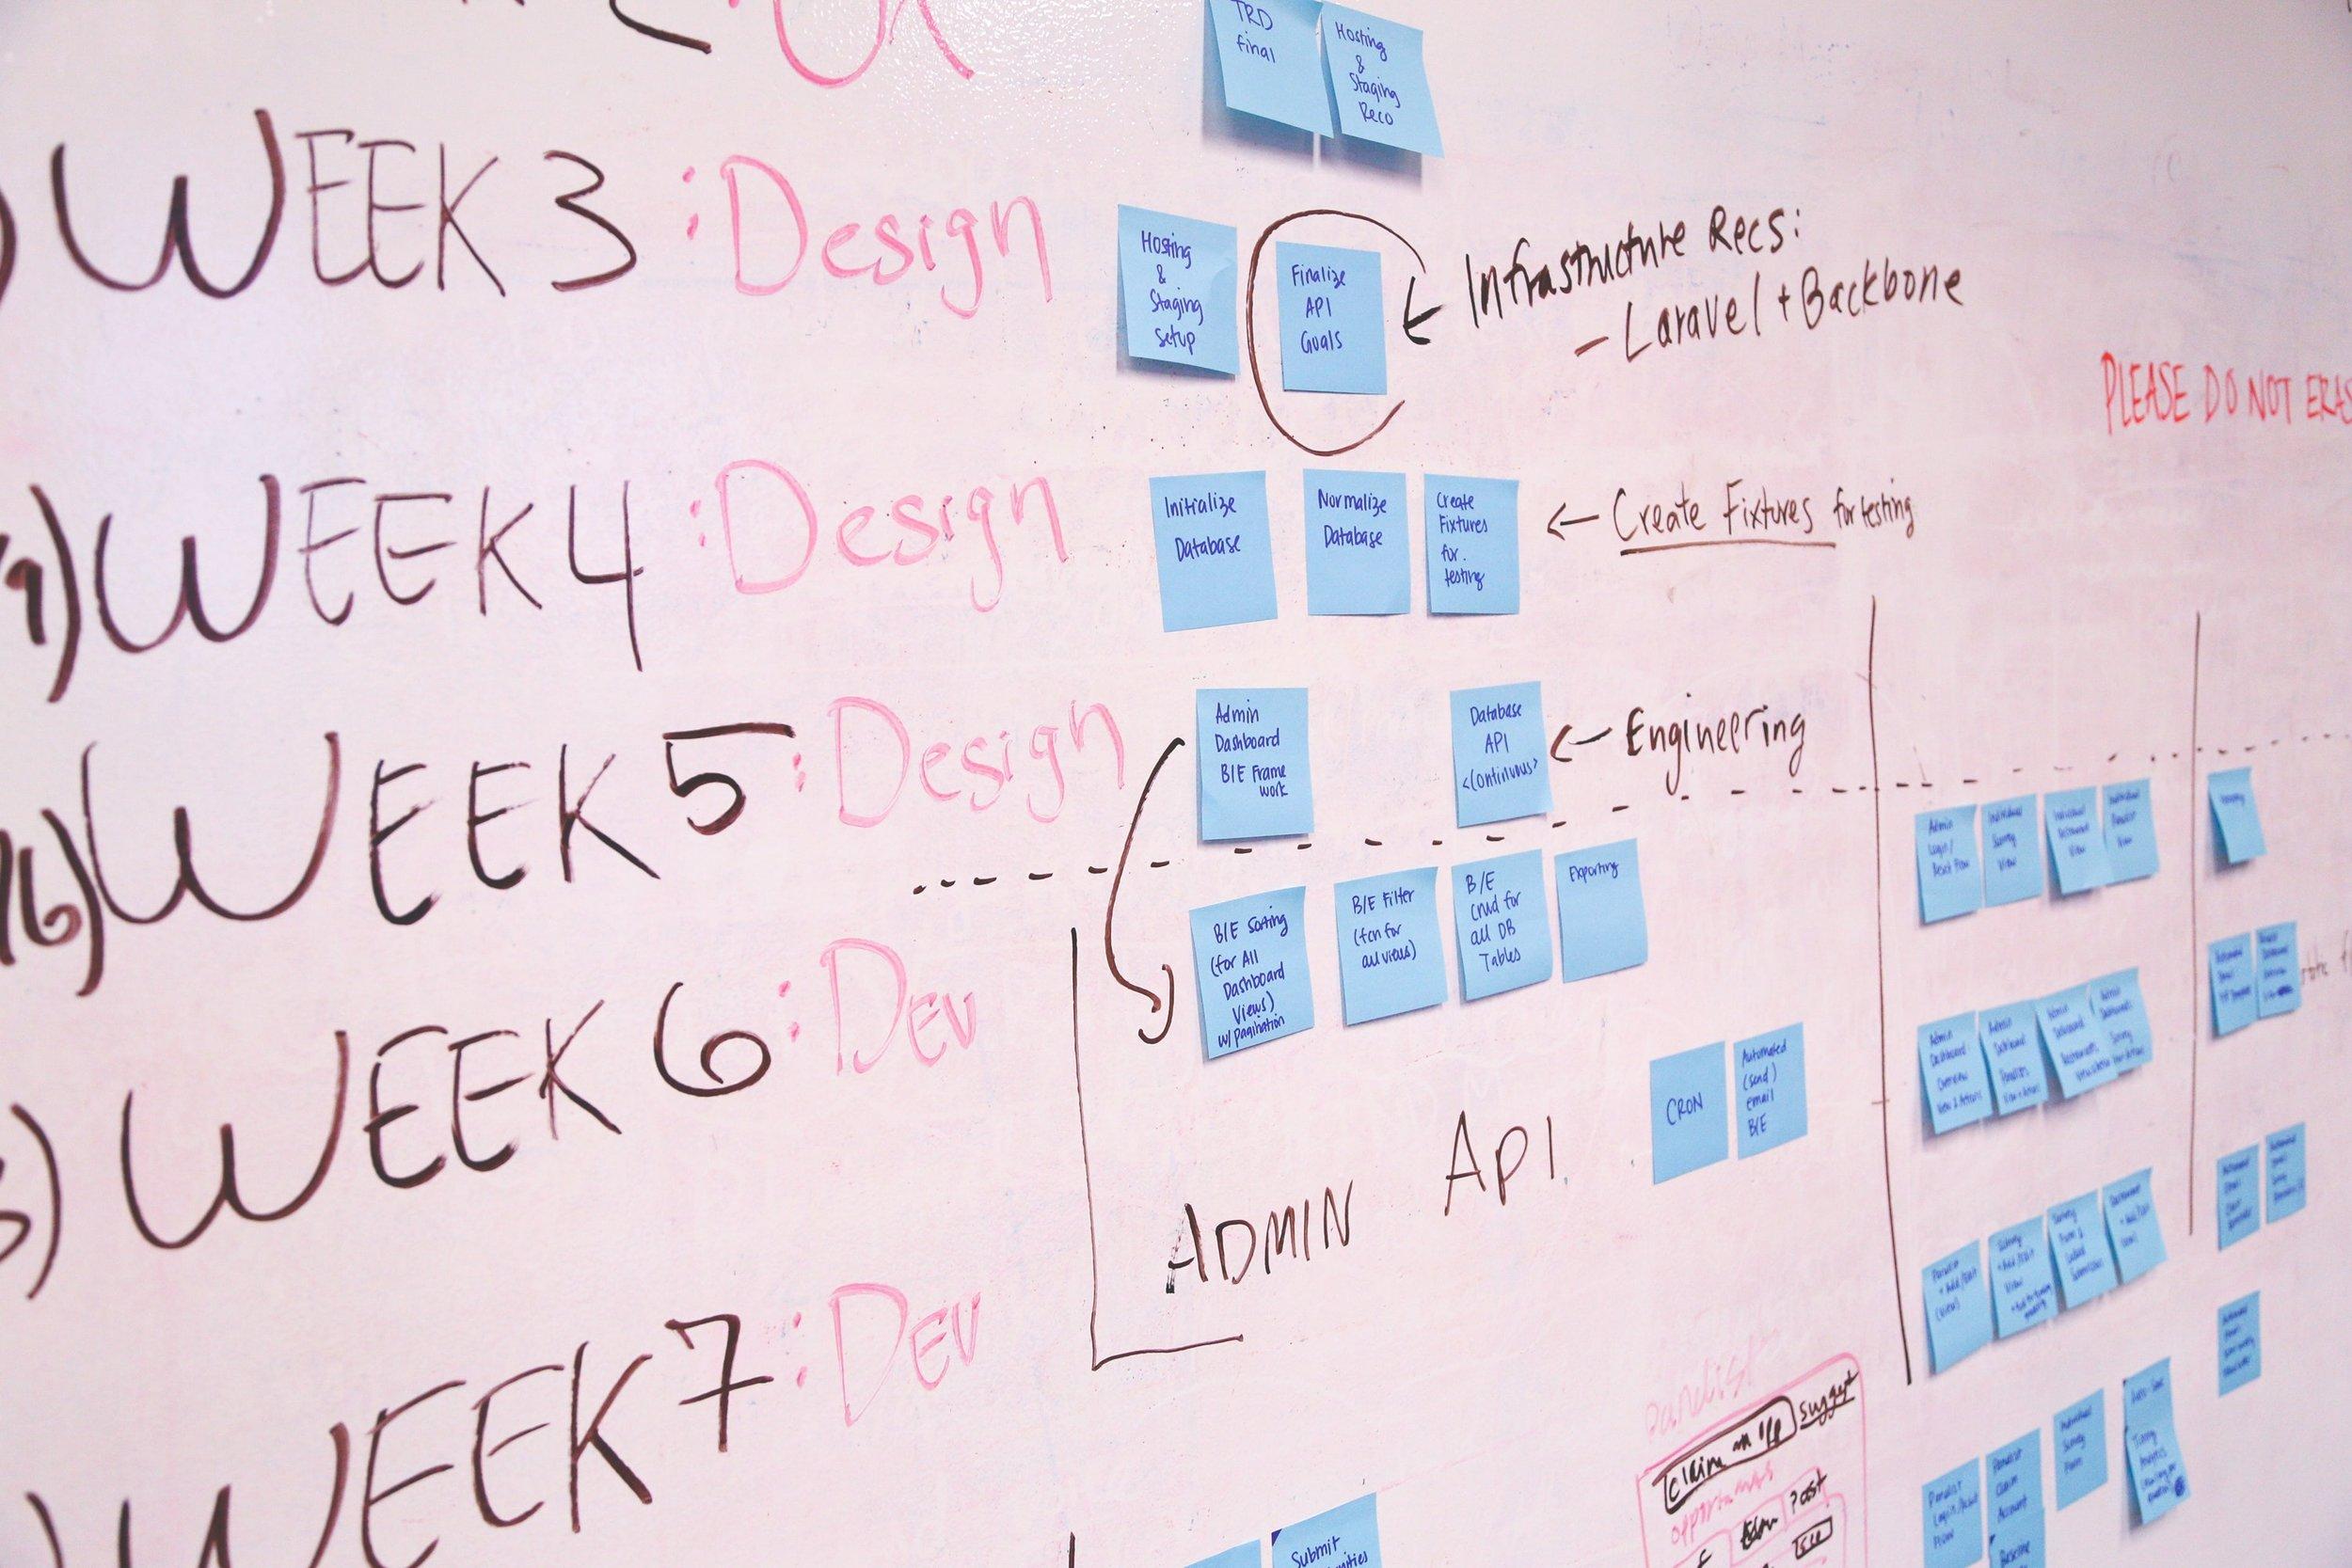 agenda-concept-development-7376.jpg